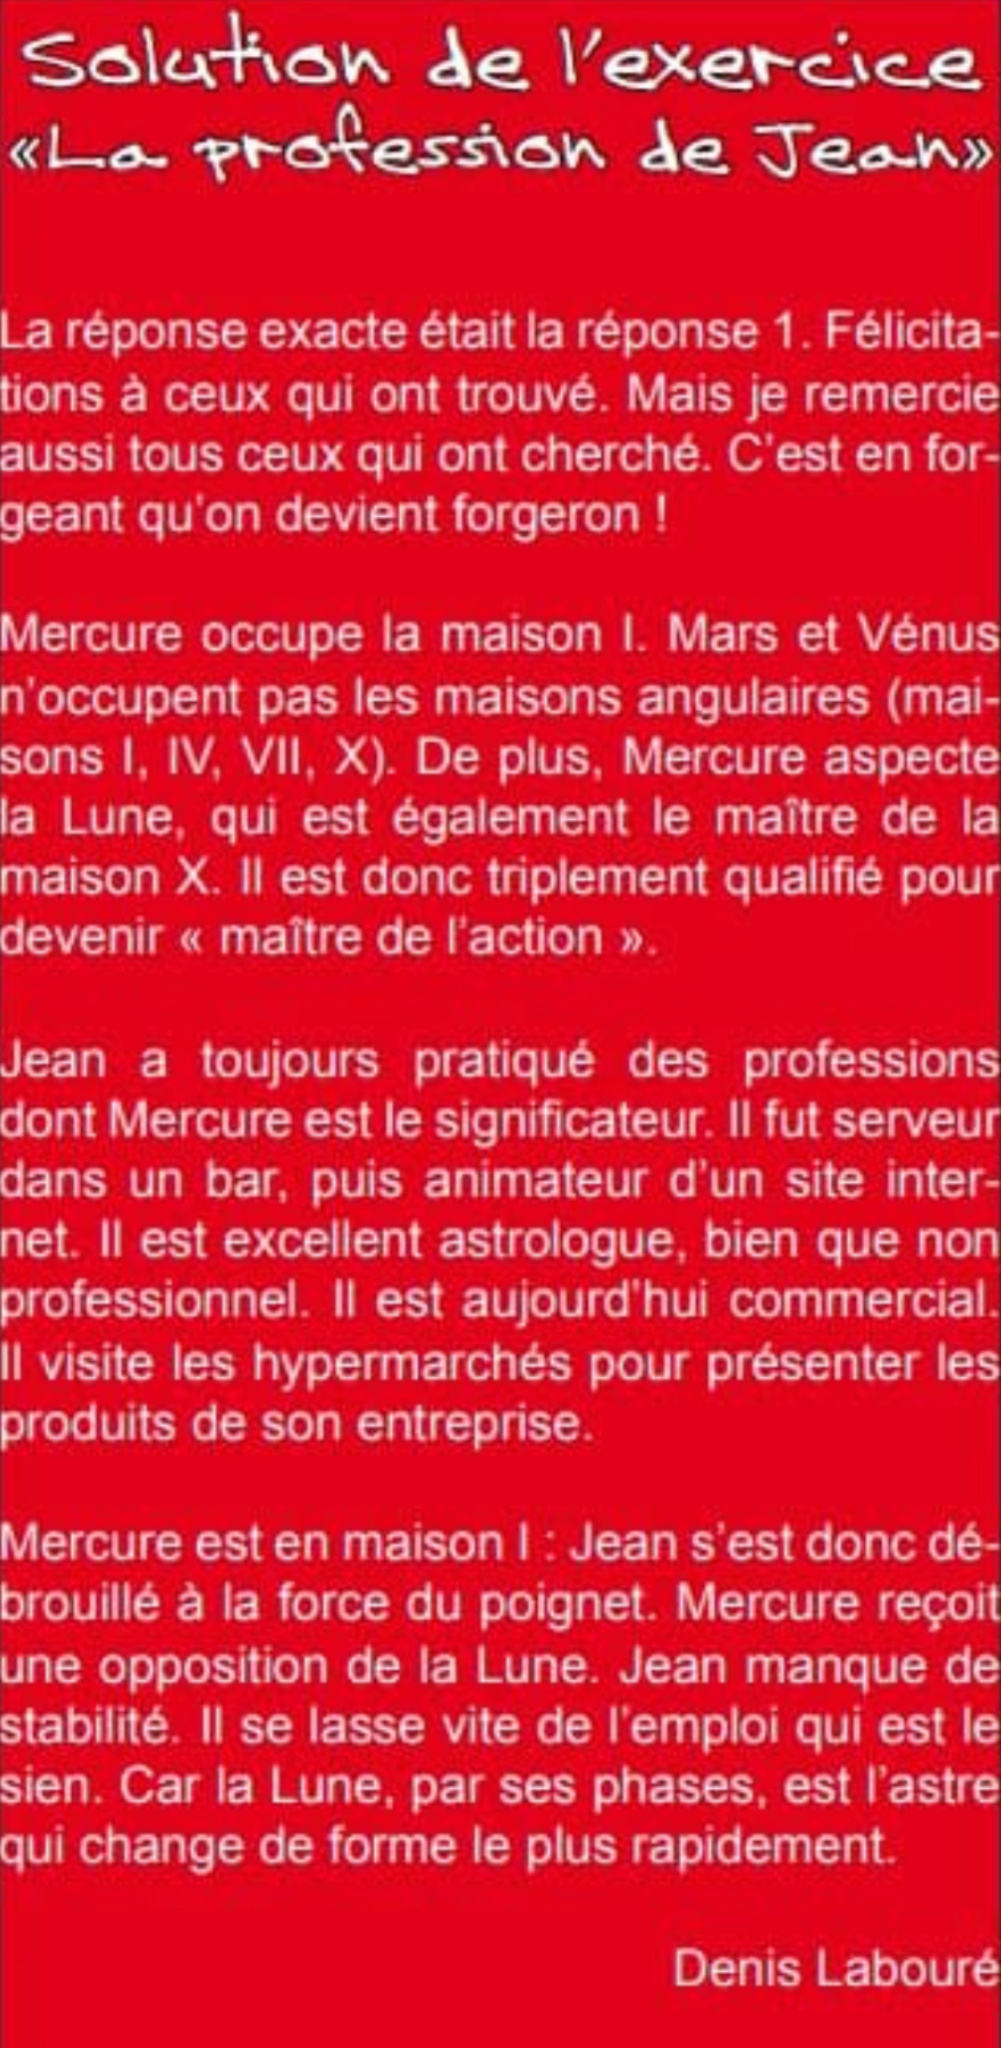 La profession de Jean Screen14